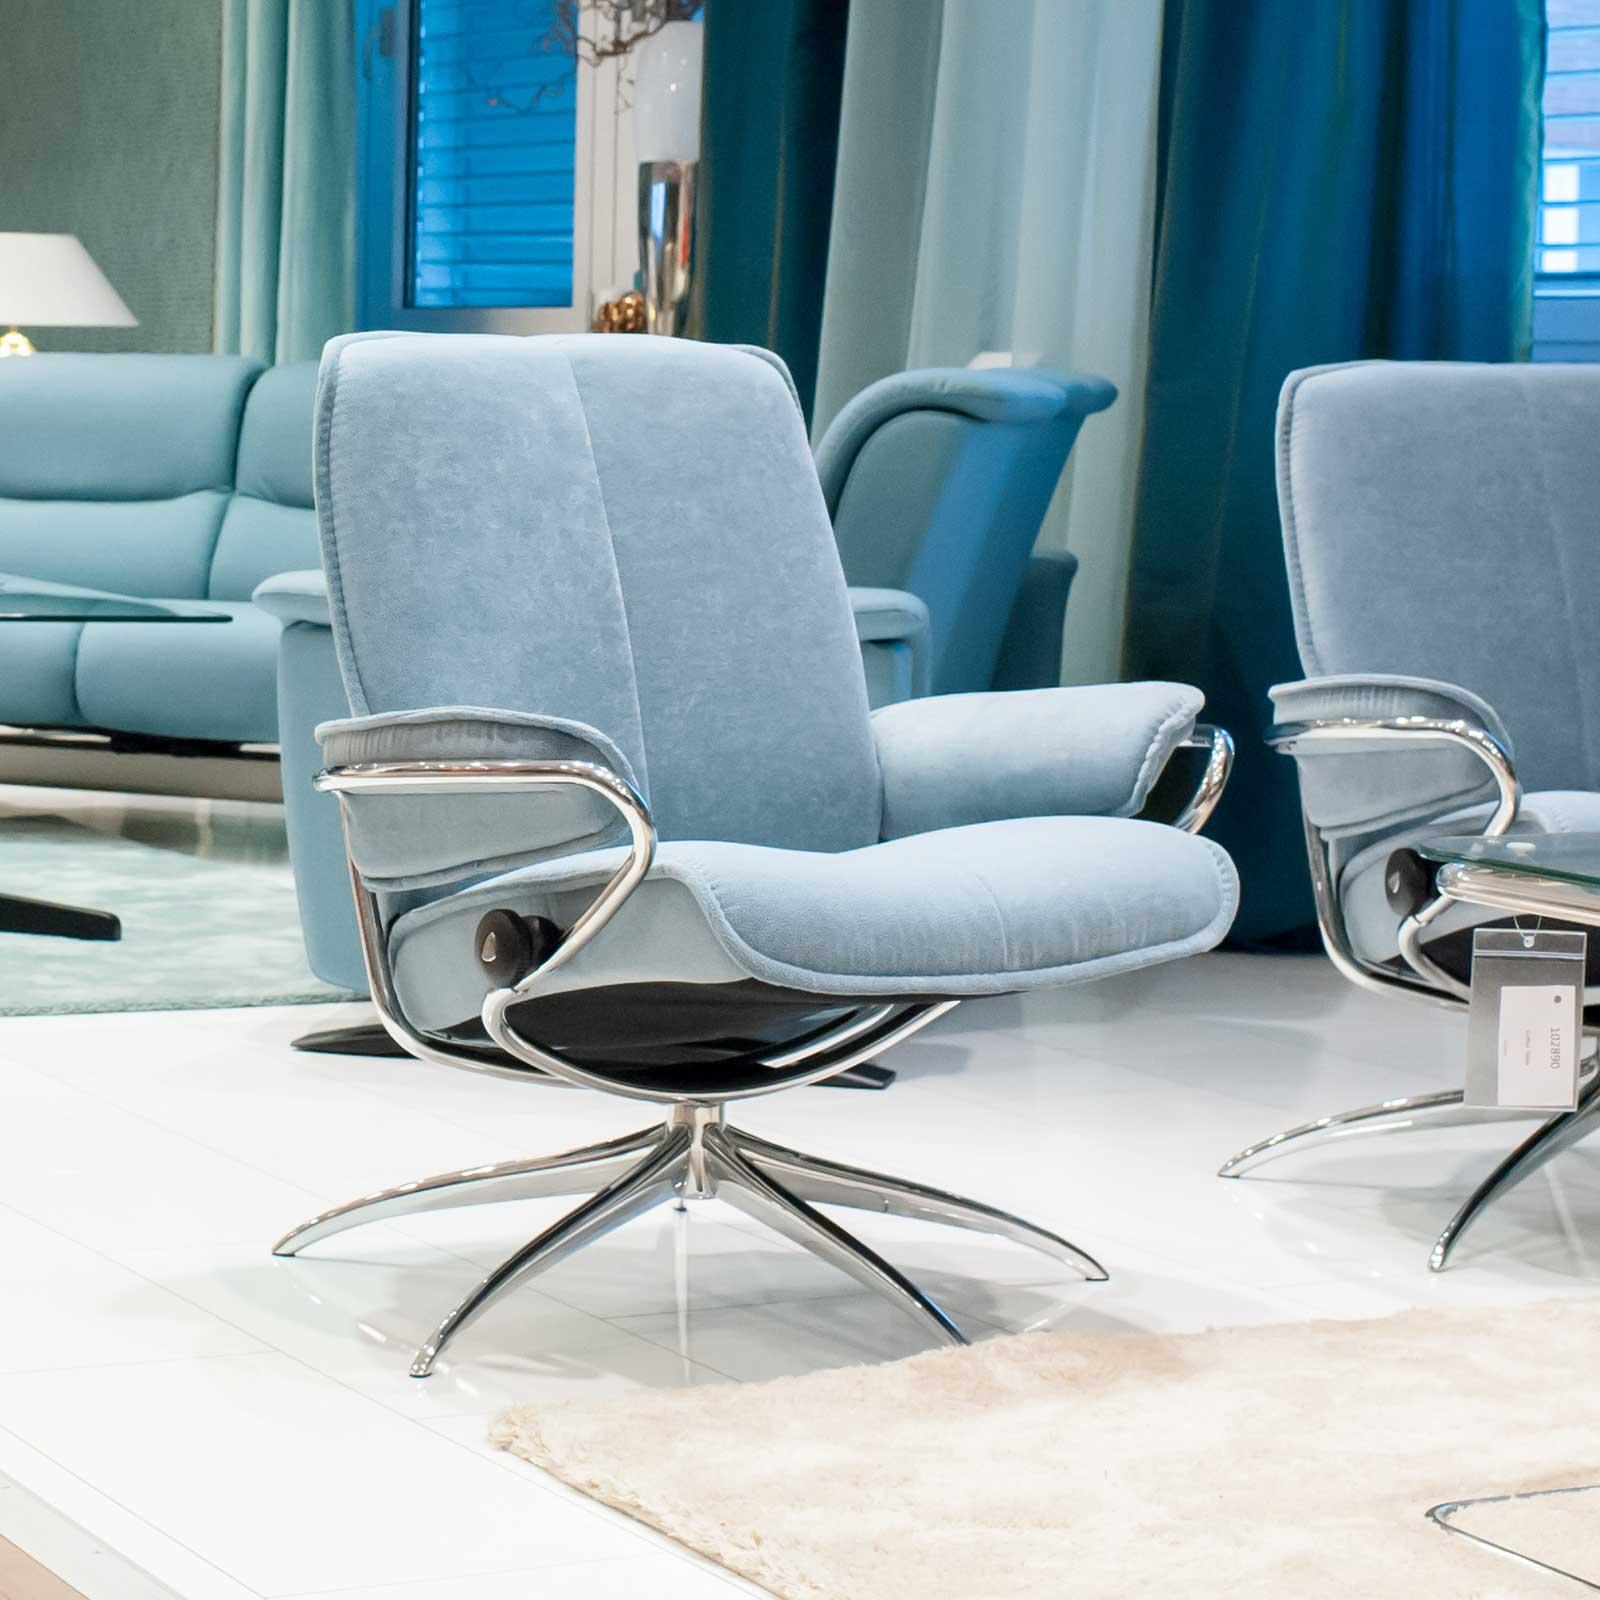 stressless sessel city low back aqua chrom stressless. Black Bedroom Furniture Sets. Home Design Ideas